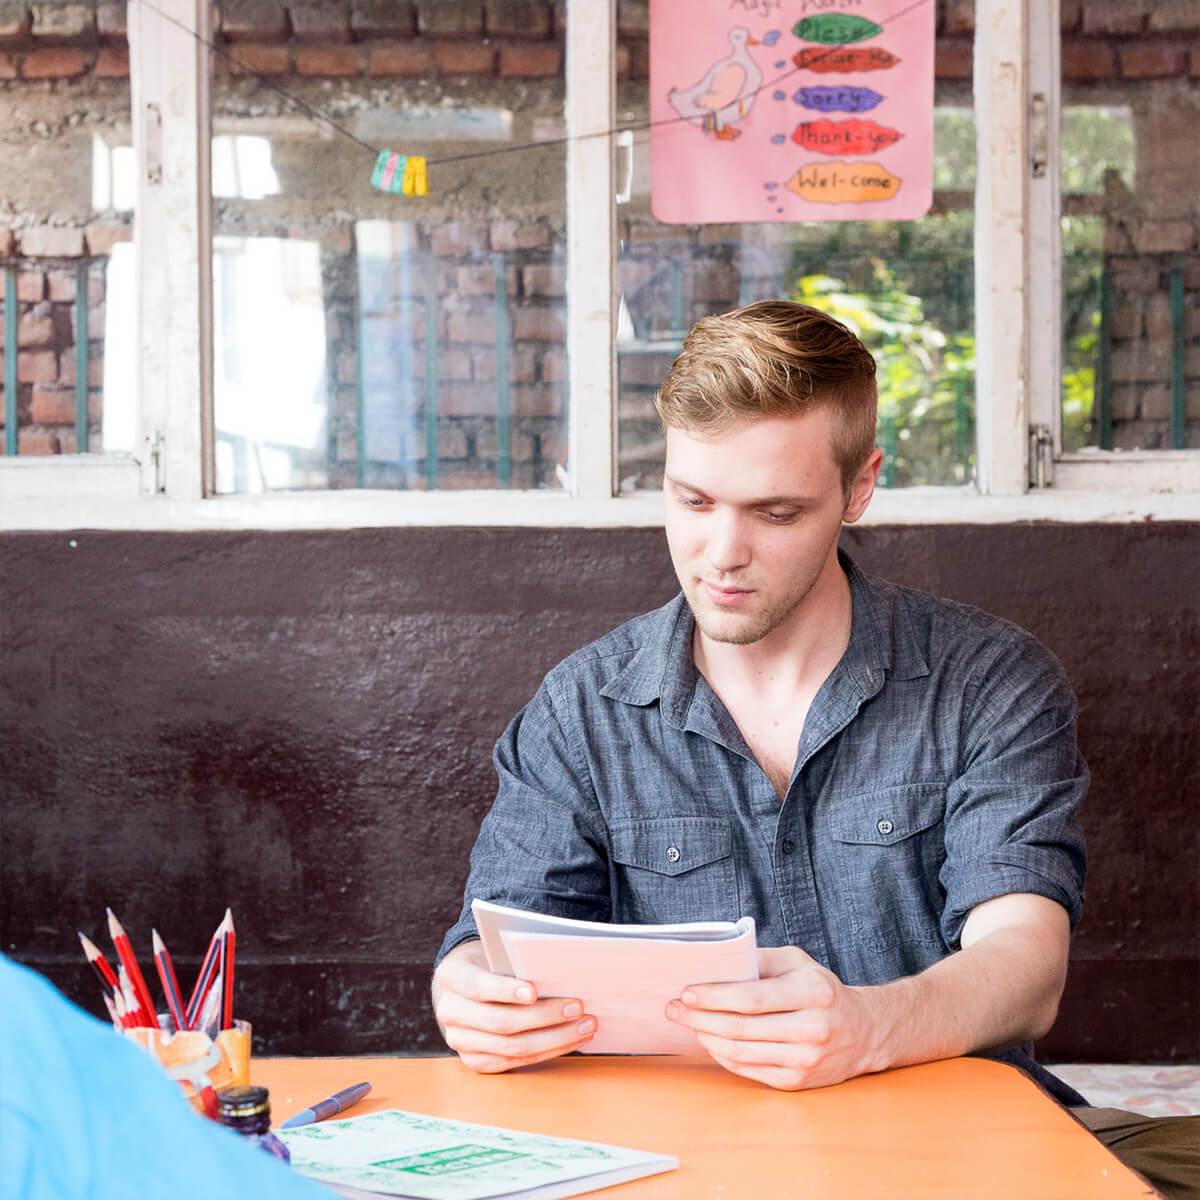 Edward Kobus reviewing paper at sitting desk.